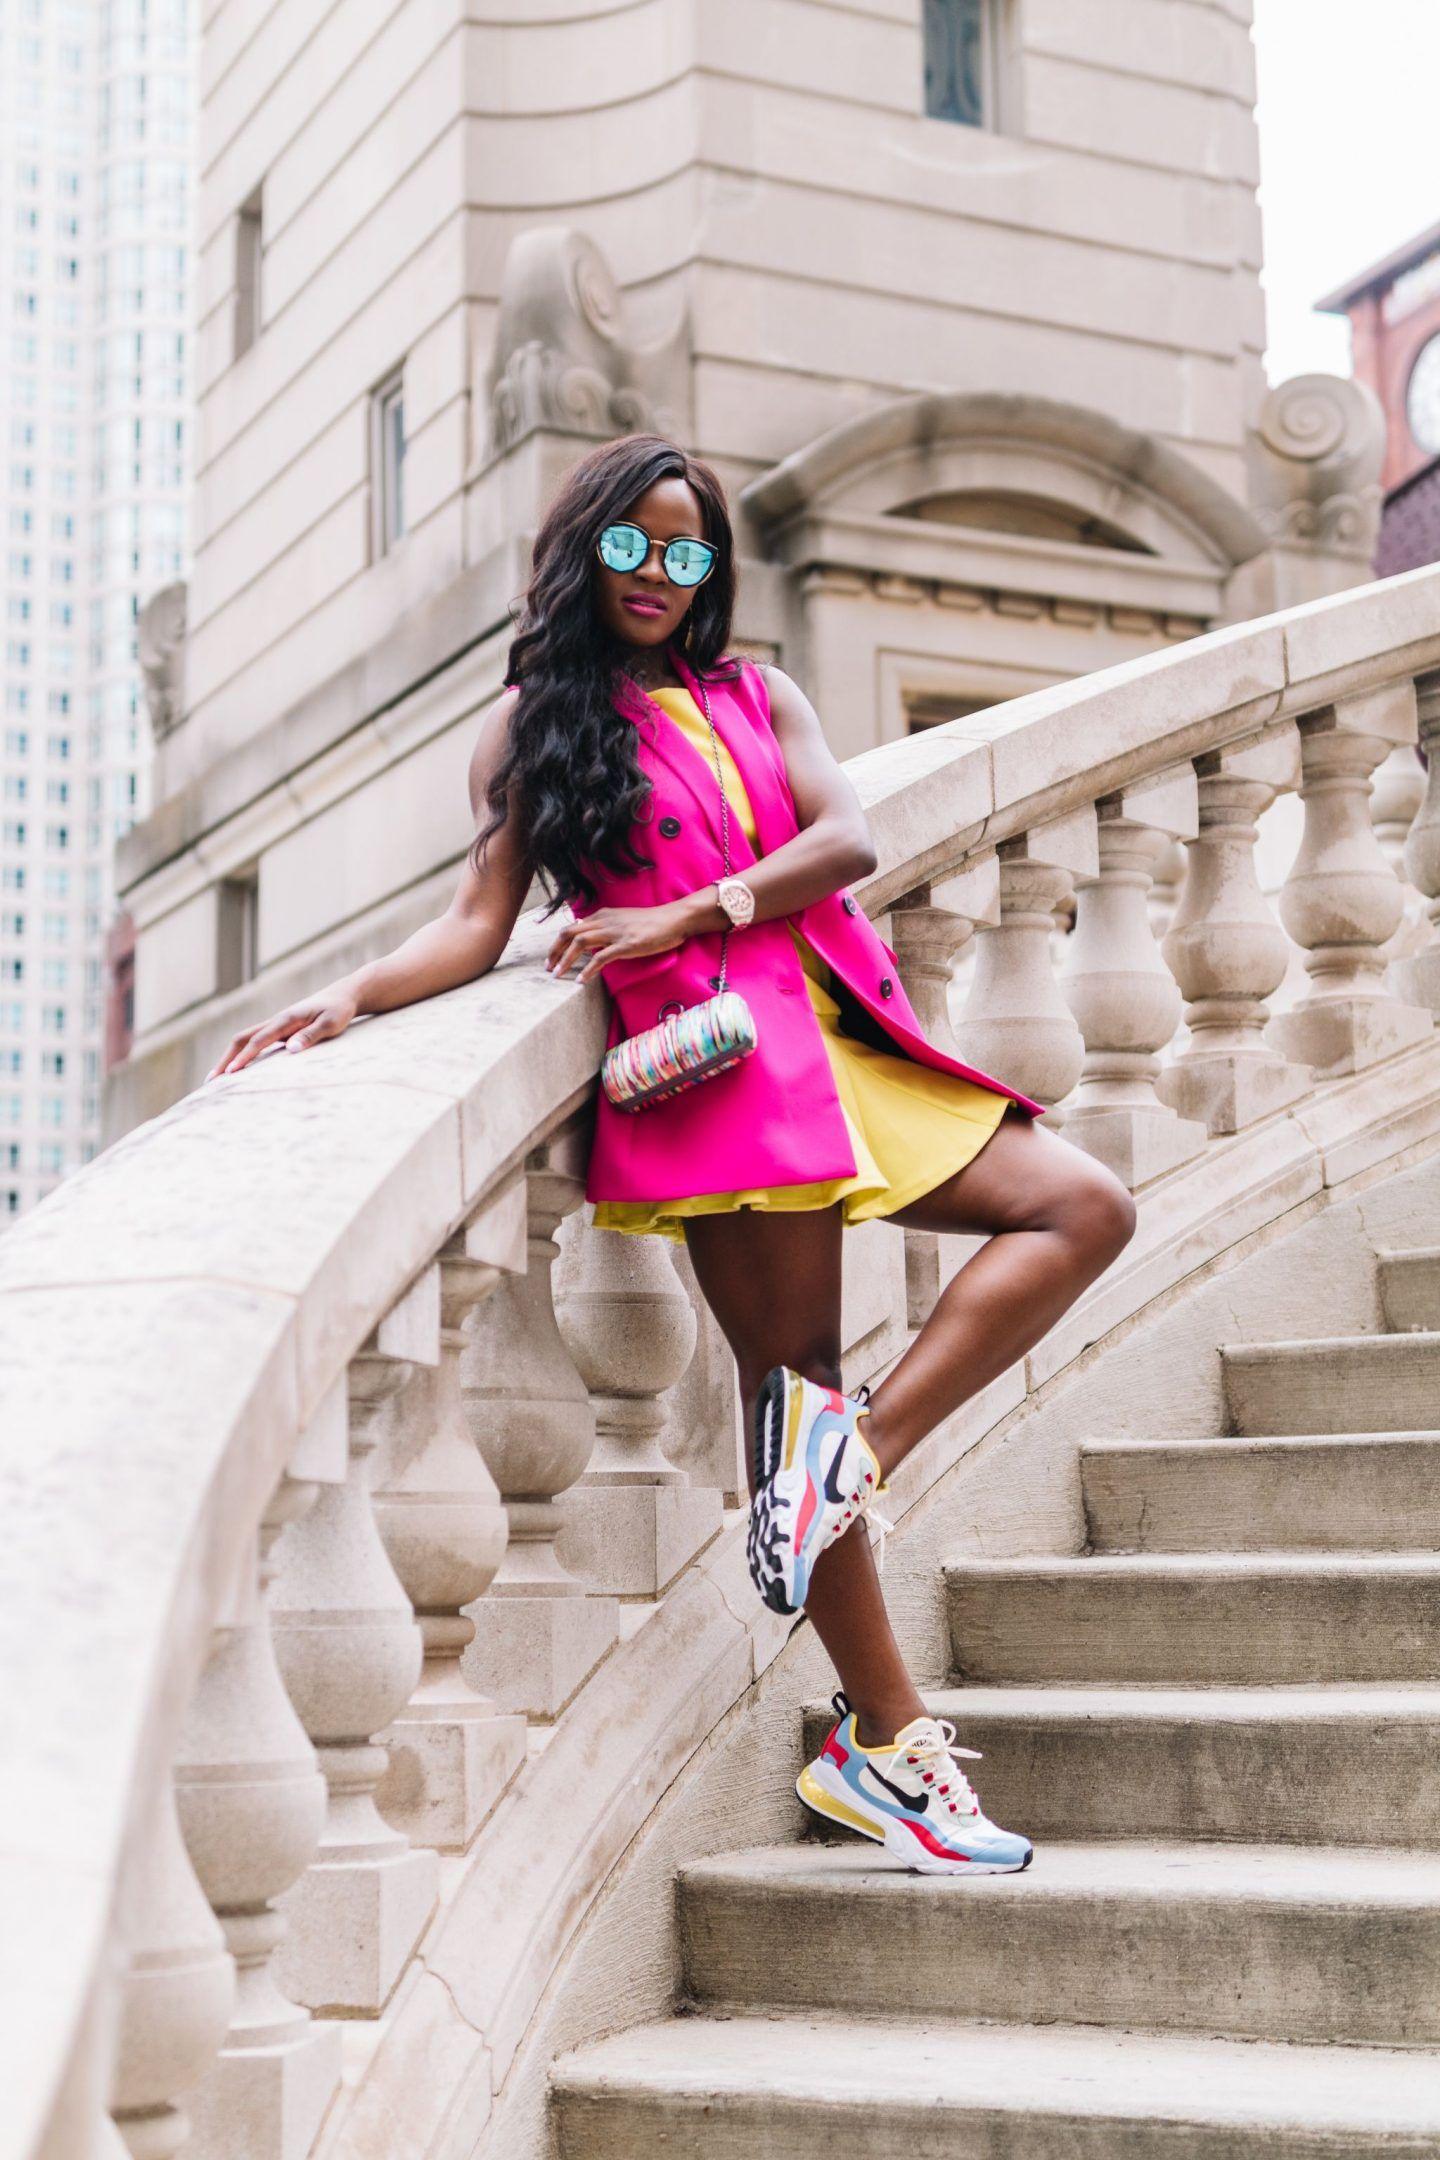 Nike Air Max 270 React Outfit Ideas : react, outfit, ideas, محرج, سيجارة, طين, Clothing, Jacksonvelosports.com